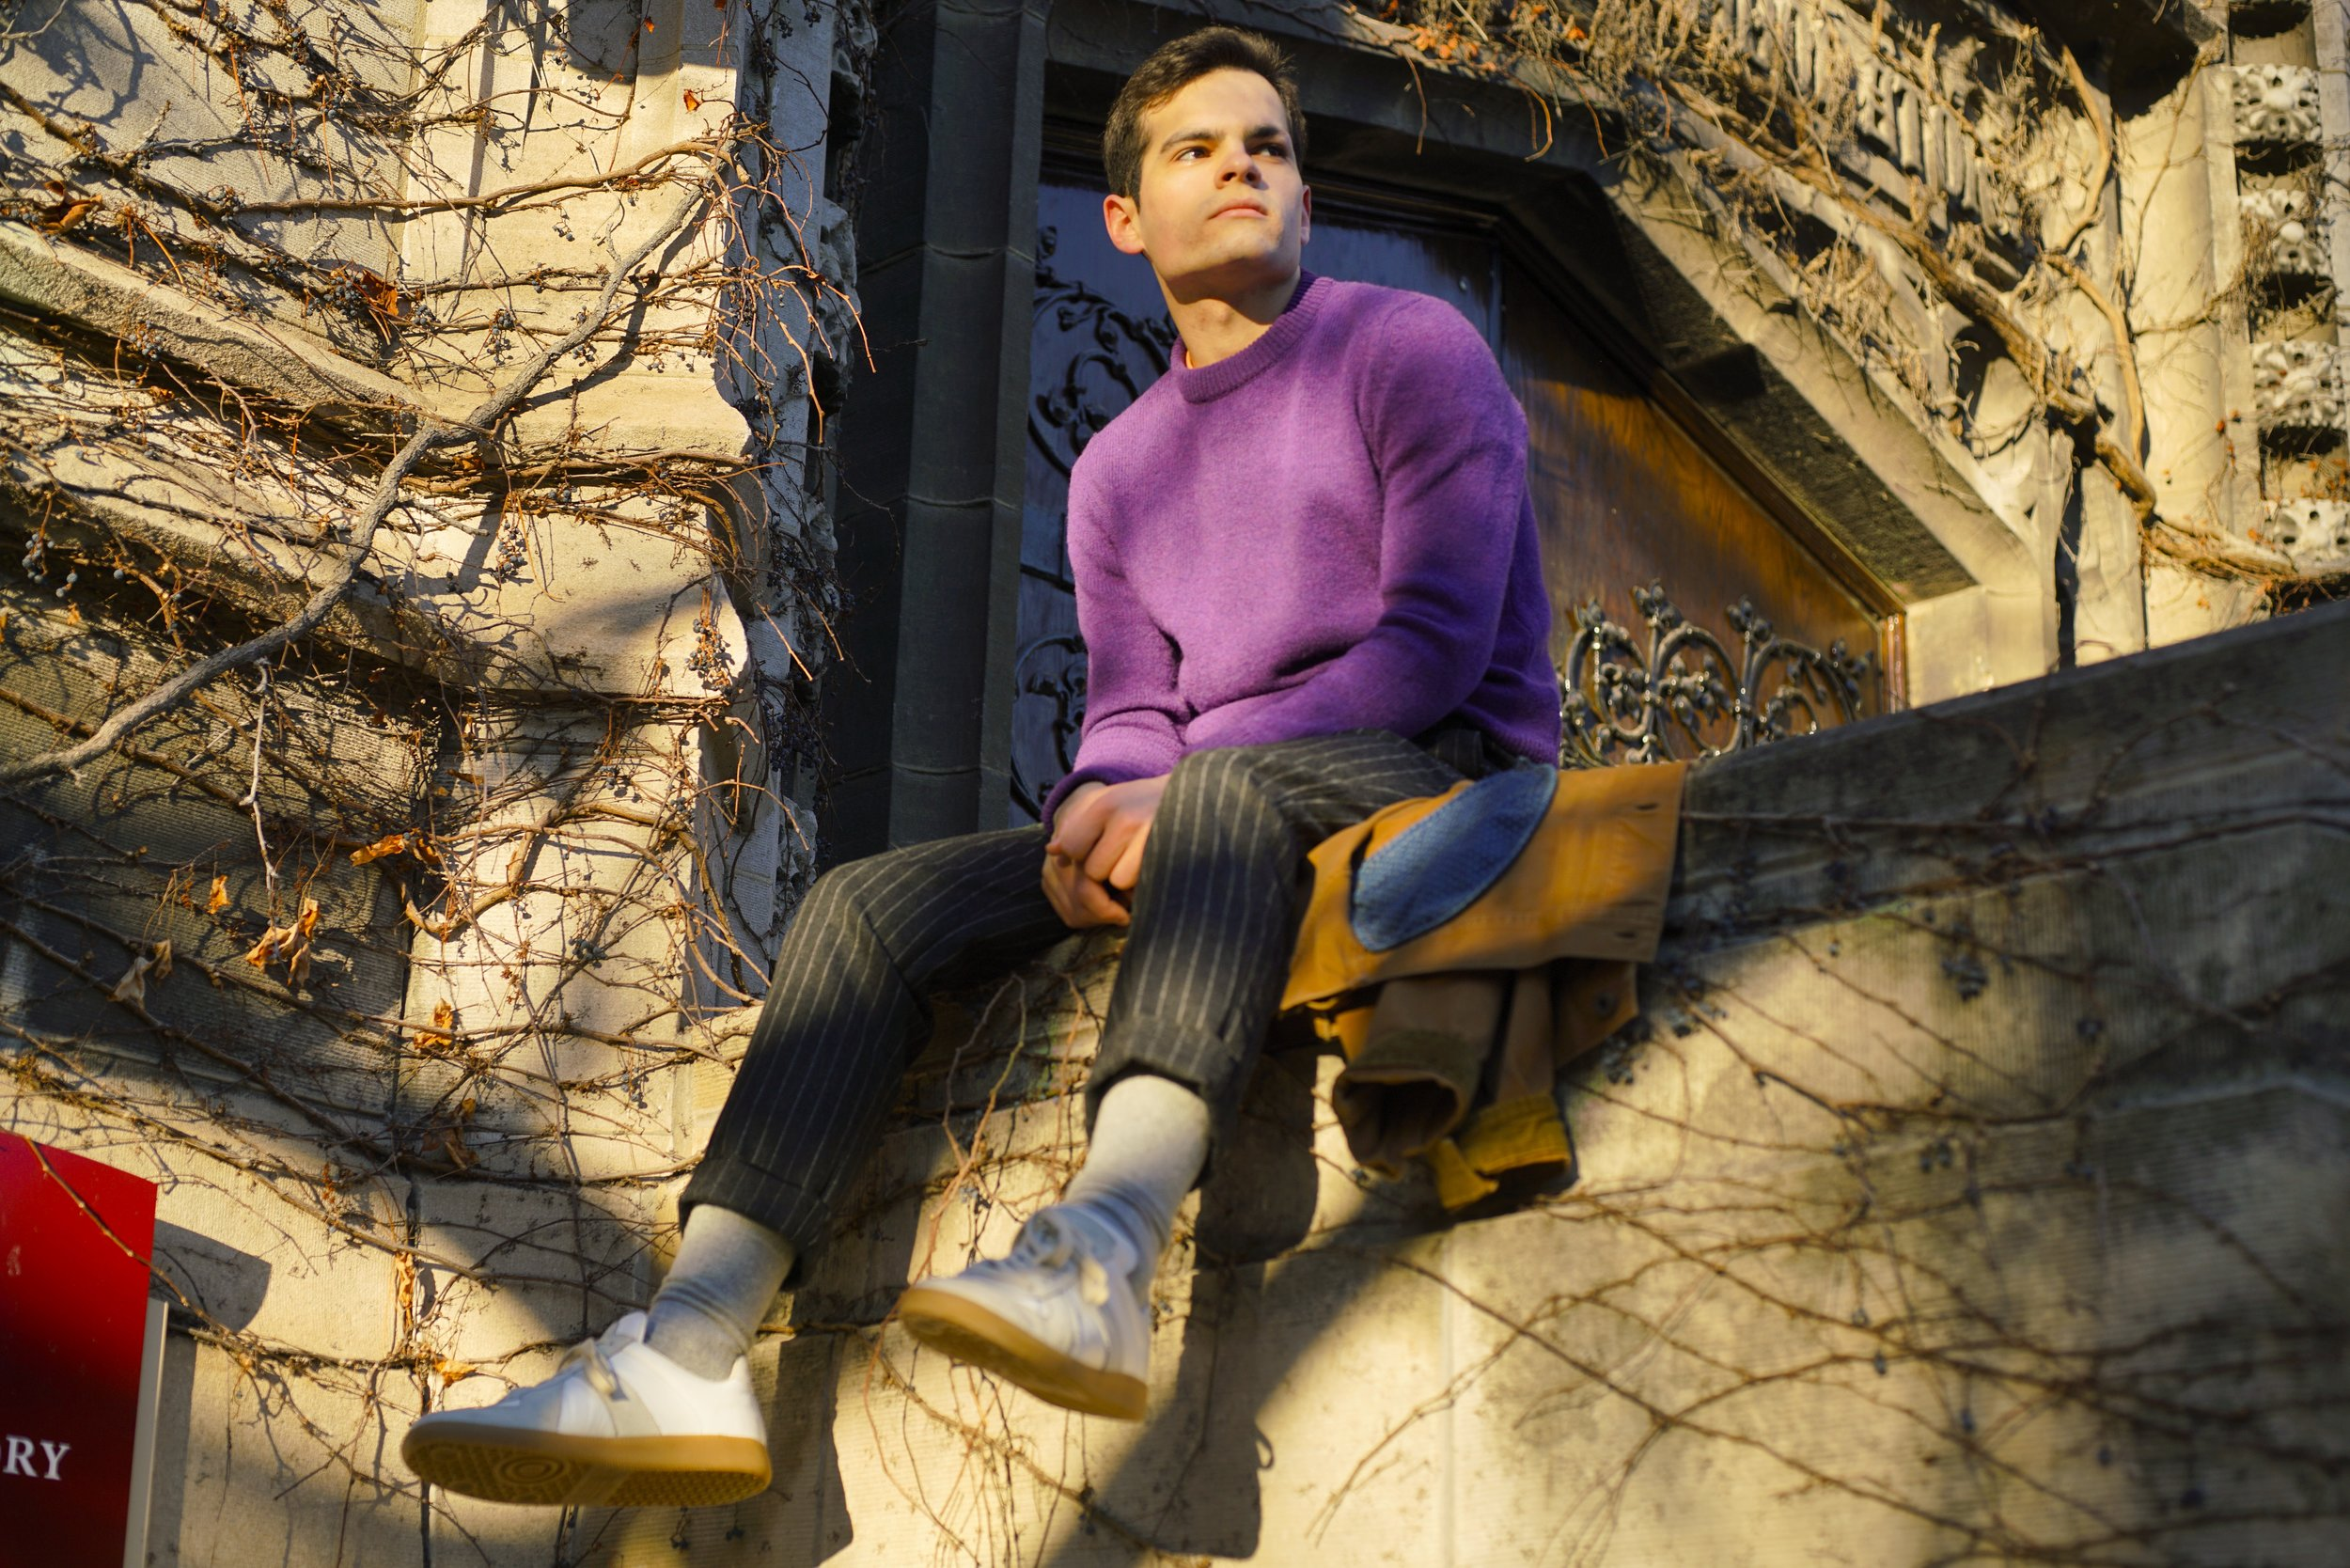 close up purple sweater.jpg